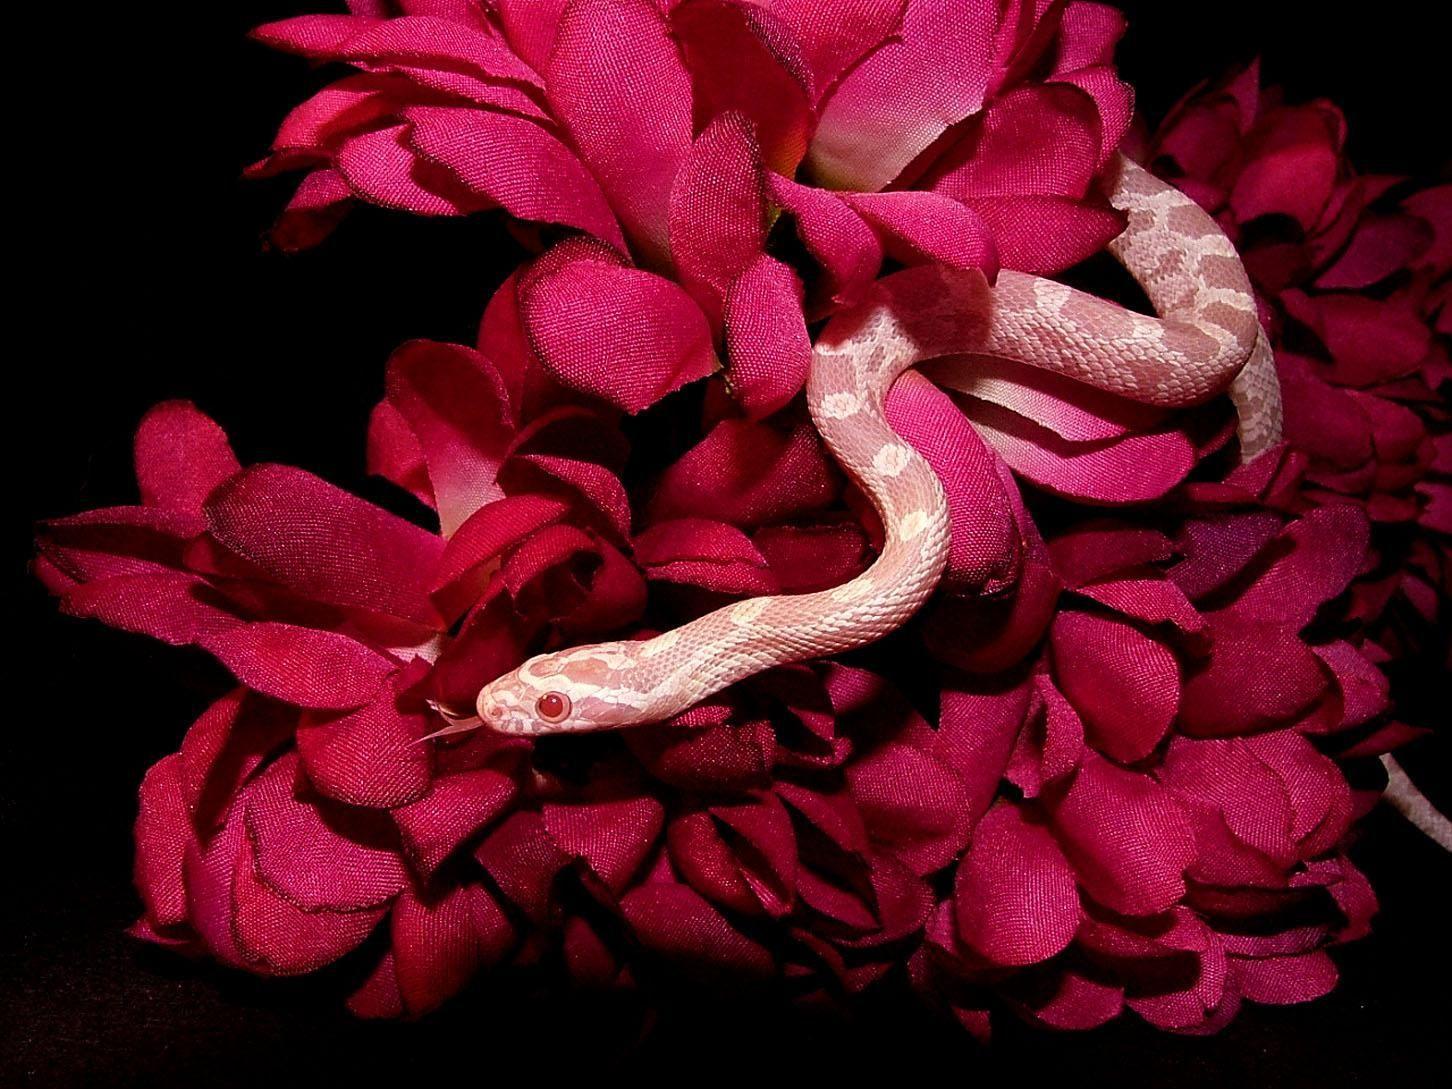 Red Snake Aesthetics Wallpapers On Wallpaperdog